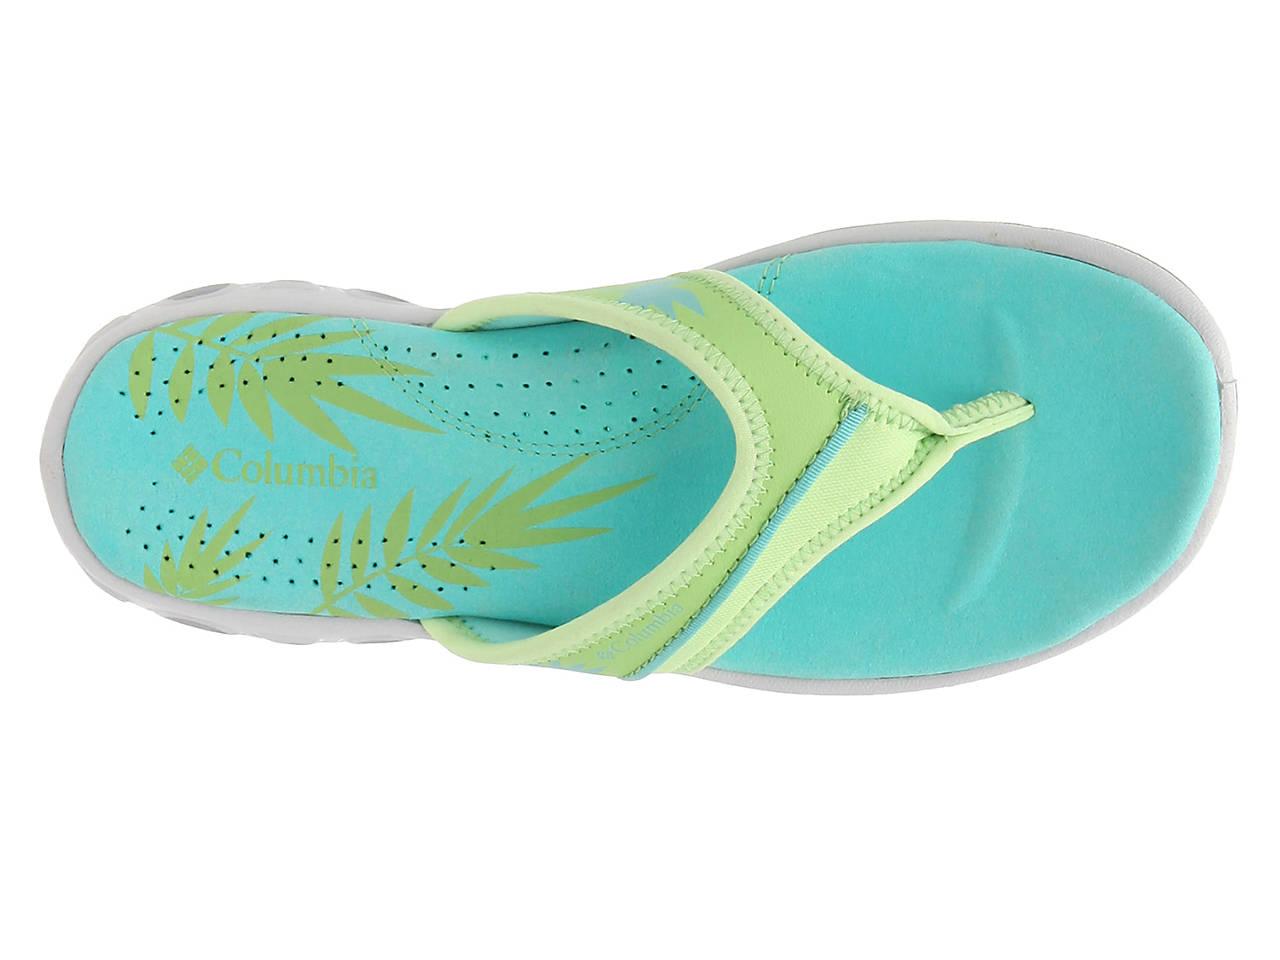 967a6bef81b Columbia Kambi Vent Flip Flop Women s Shoes